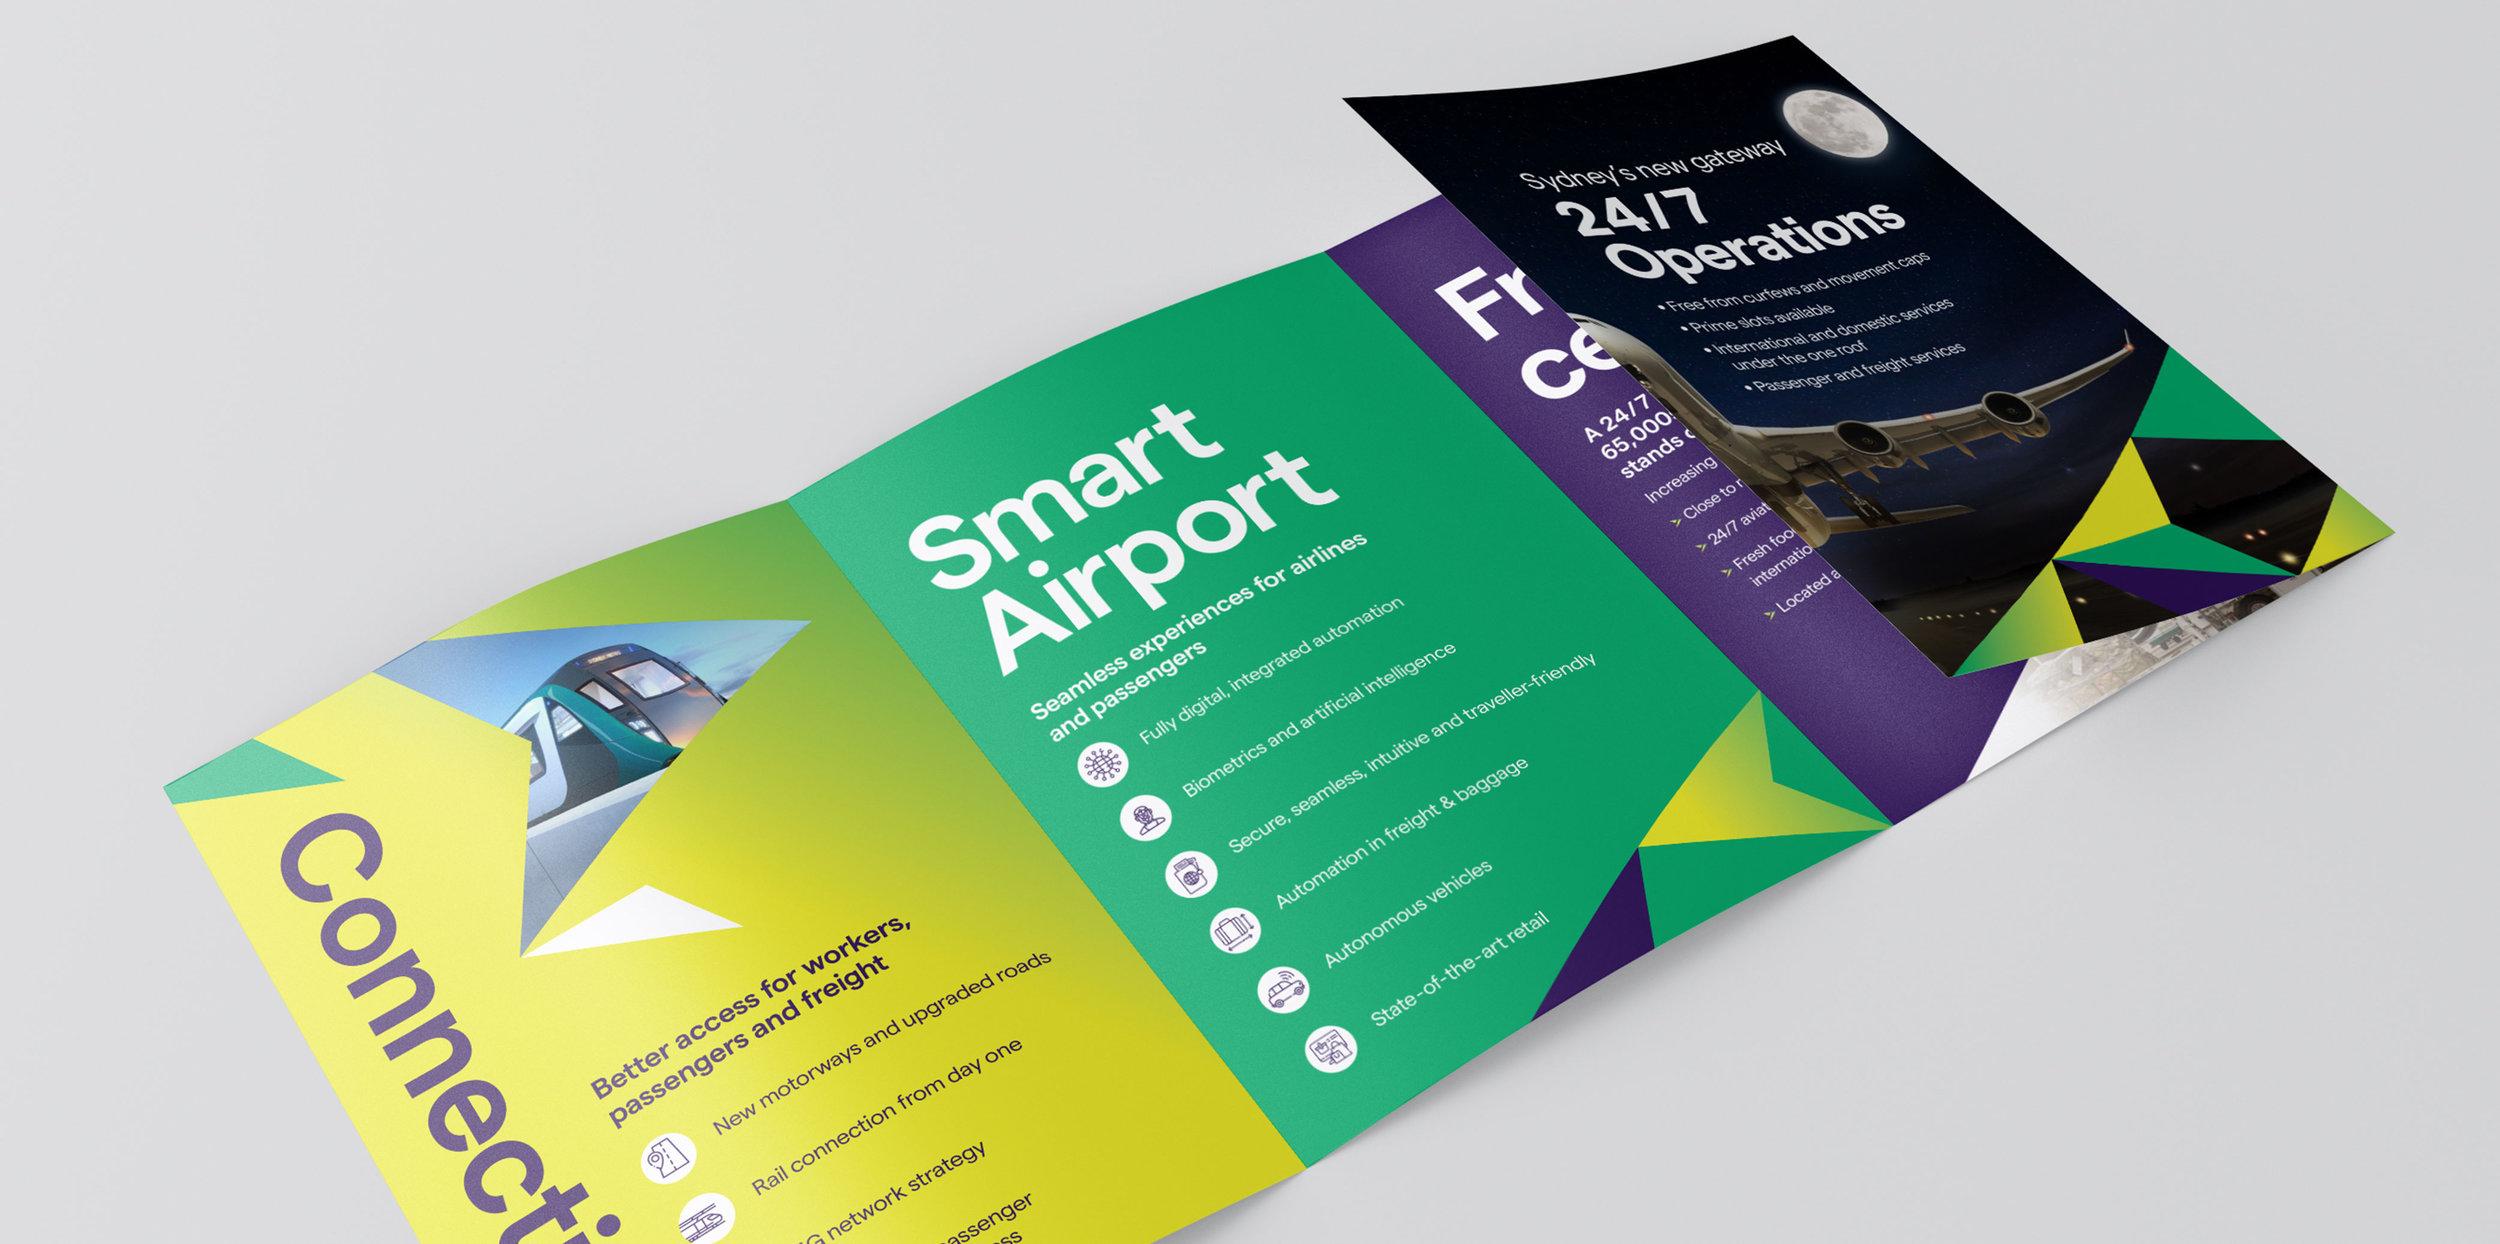 WSACO_A5-Double-Gatefold-Brochure-Design-Western-Sydney-Airport_2A.jpg